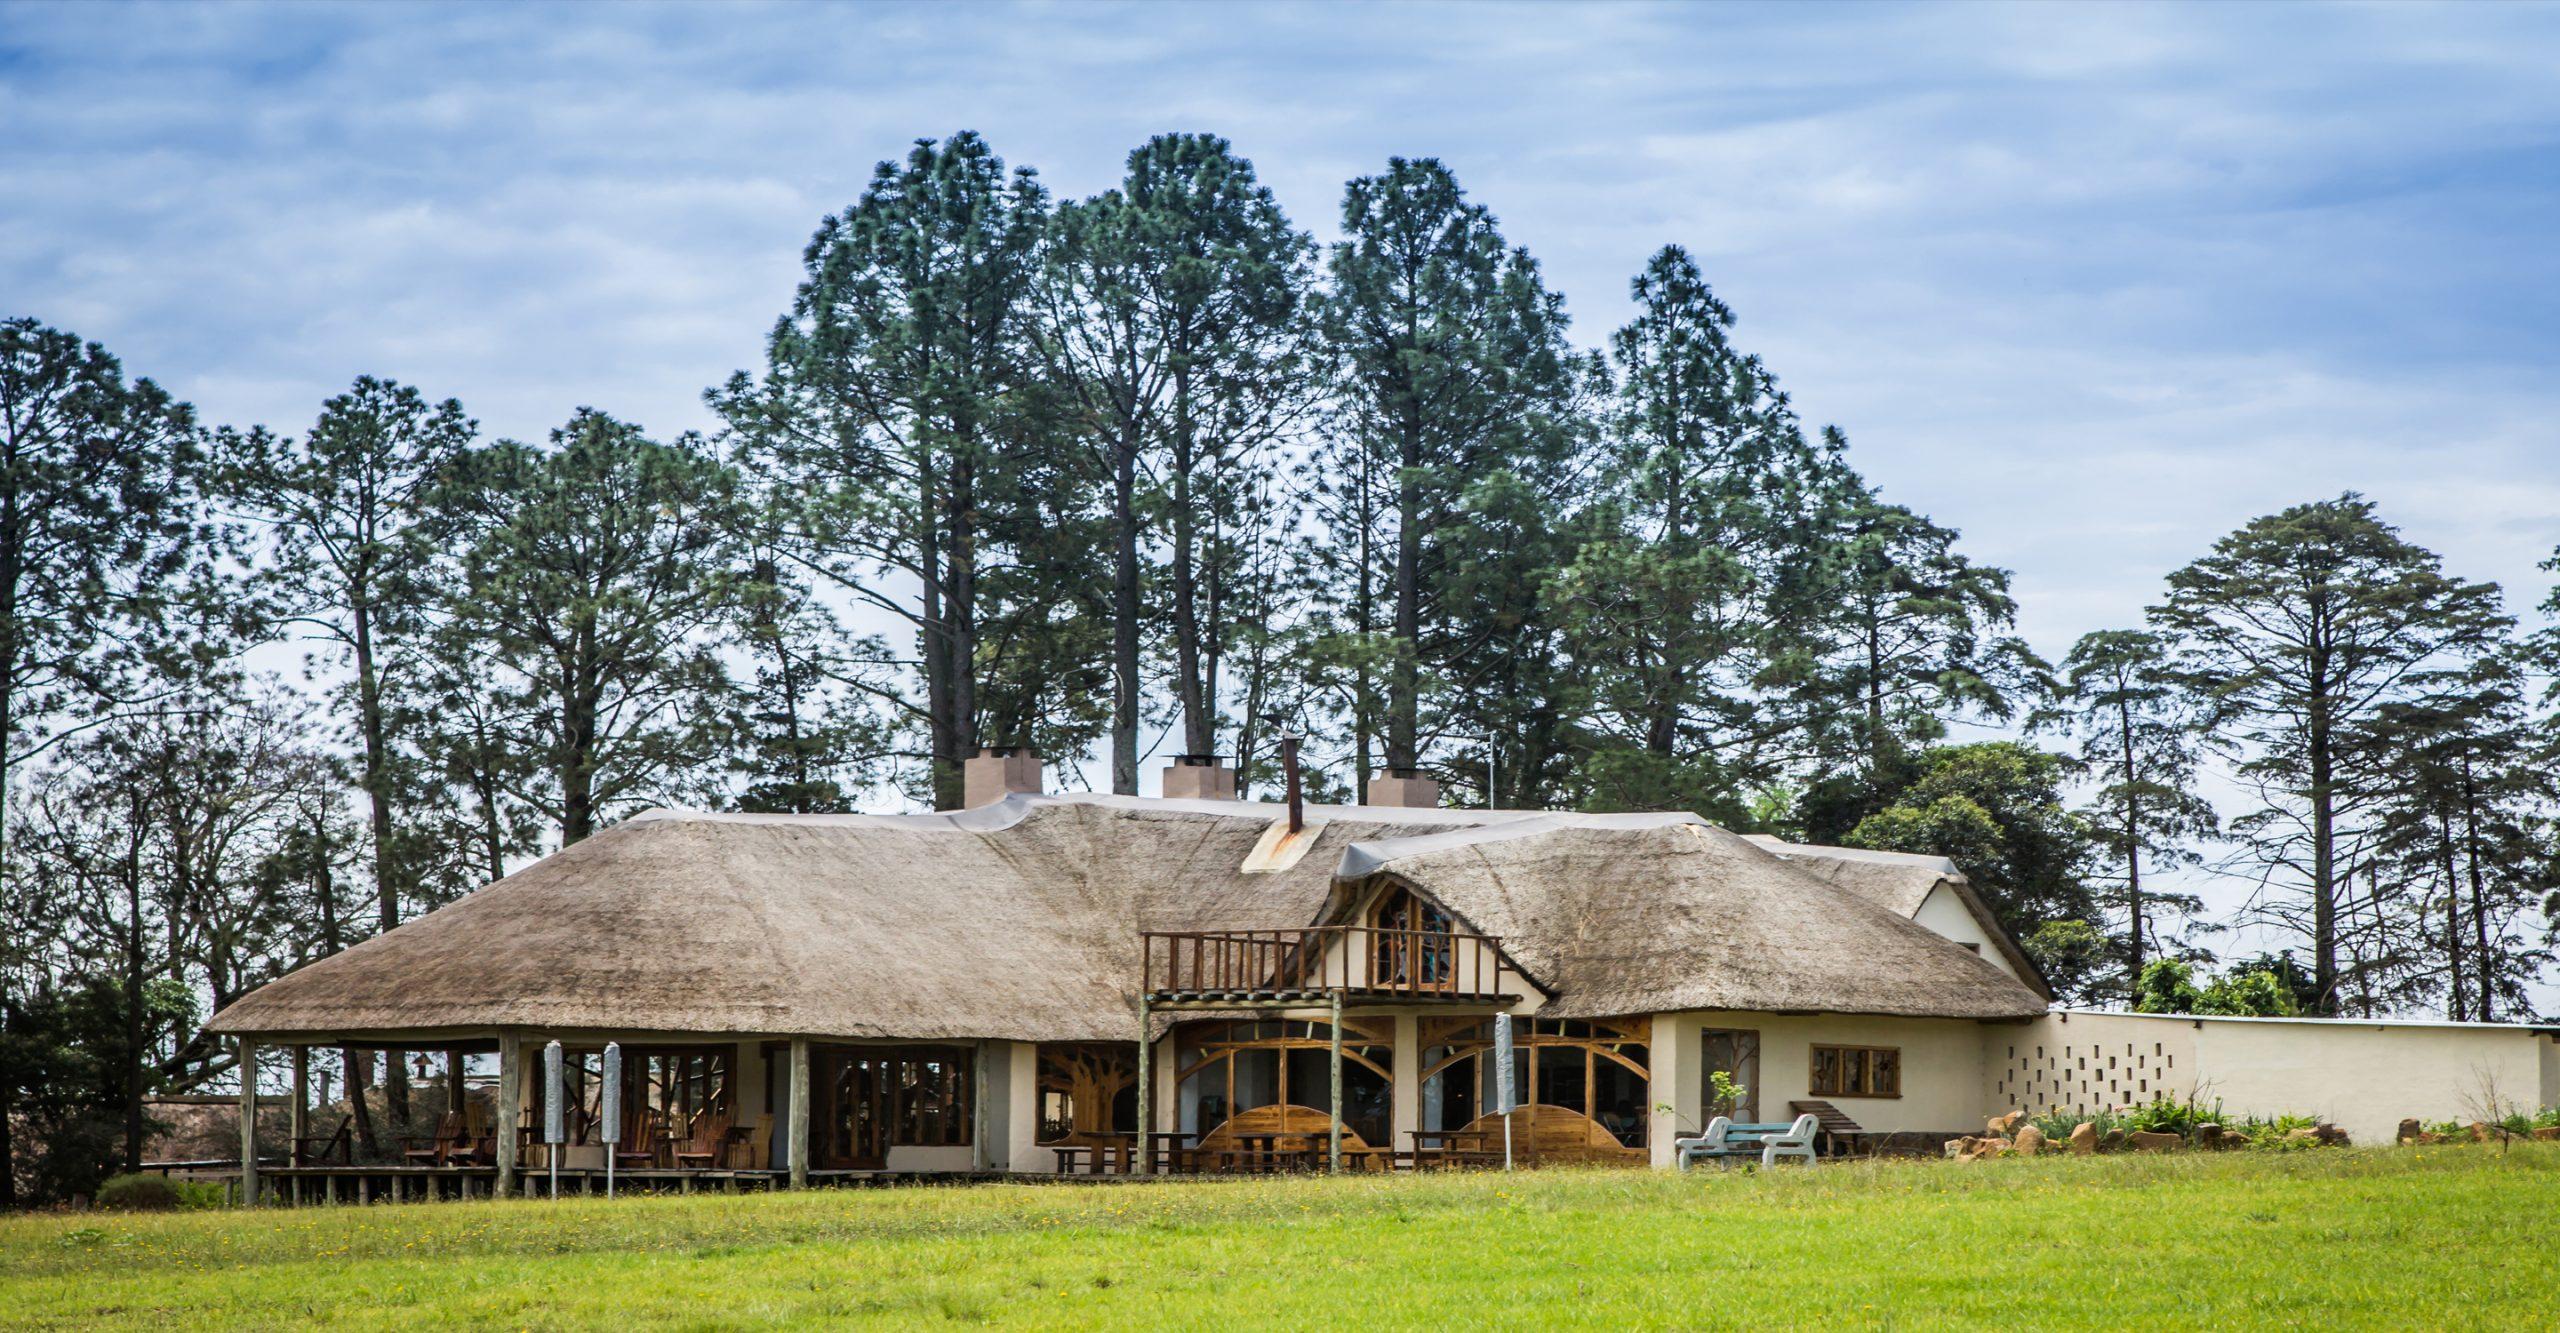 Antbear Lodge